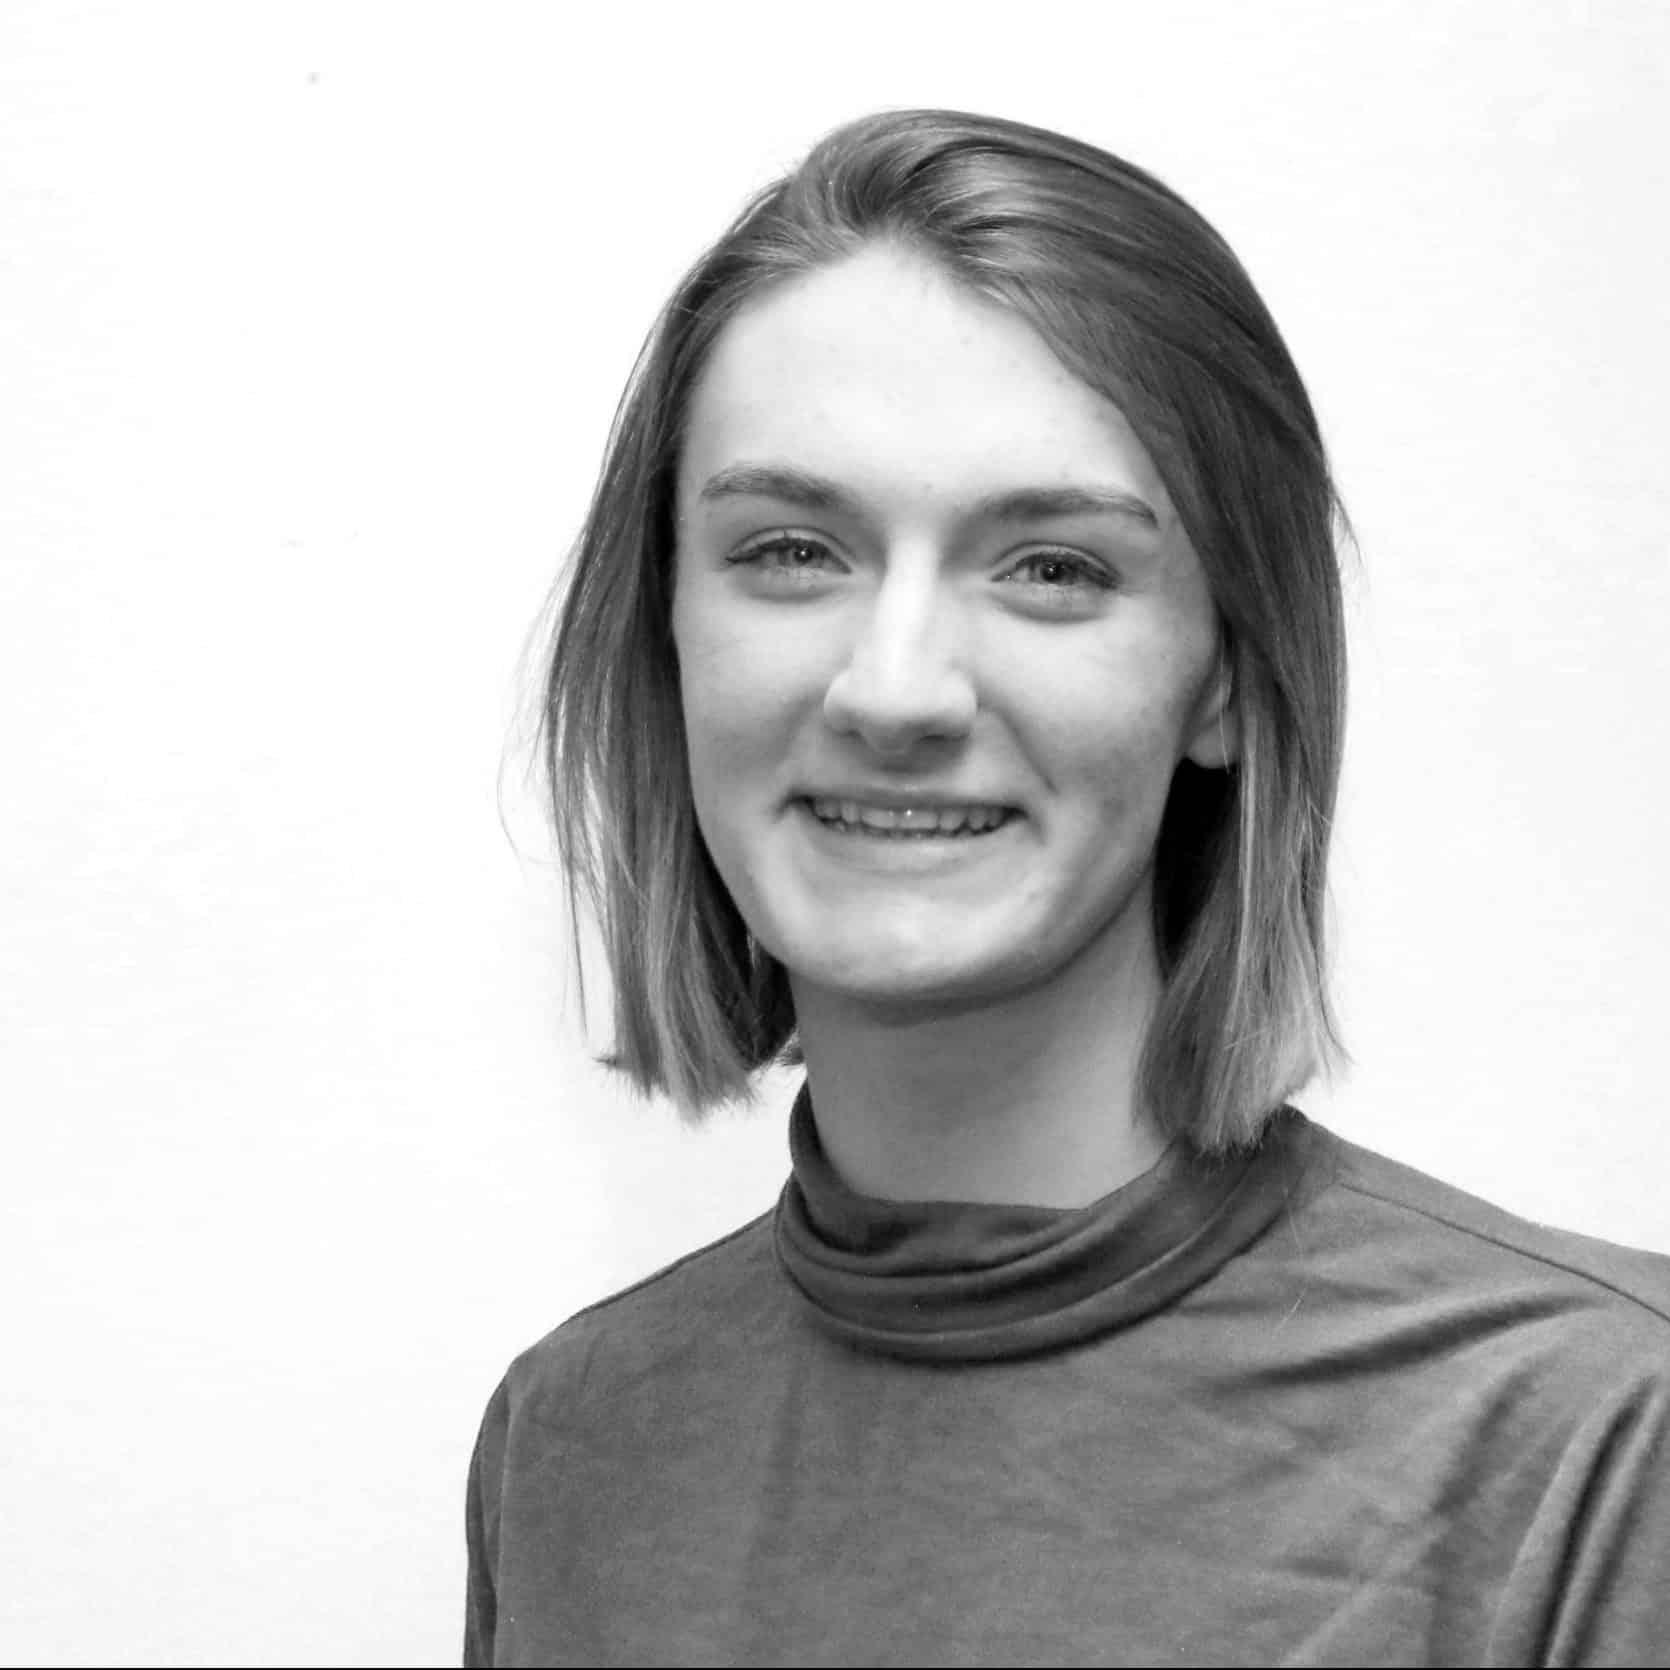 Madelyn VanRisseghem